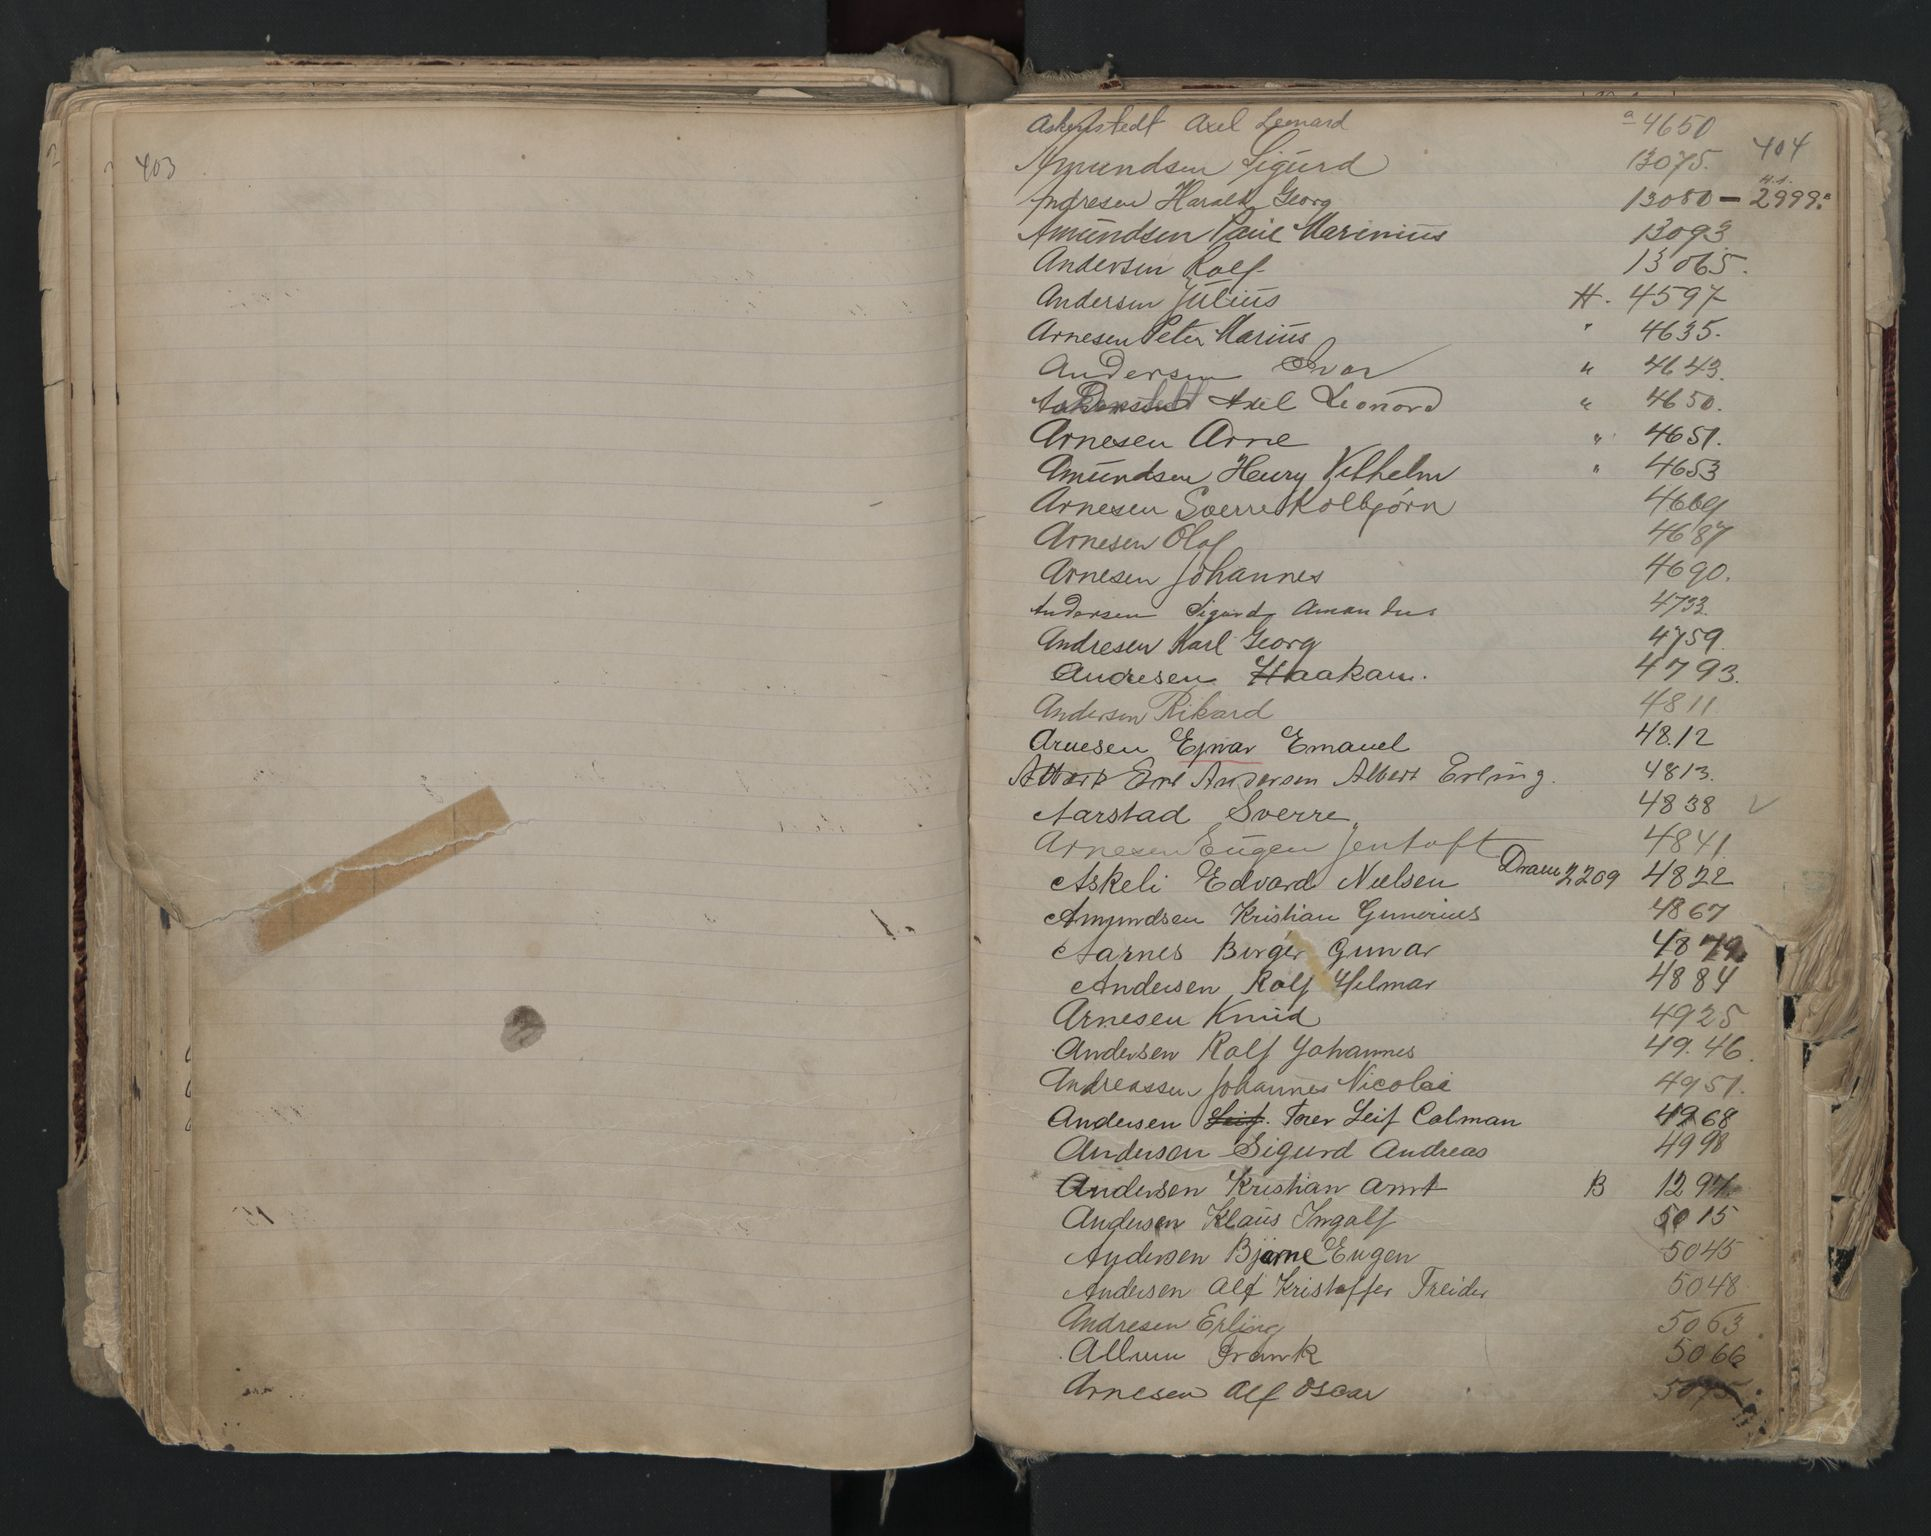 SAO, Oslo sjømannskontor, F/Fa/L0002: Register for Kristiania krets, 1866-1930, s. 403-404